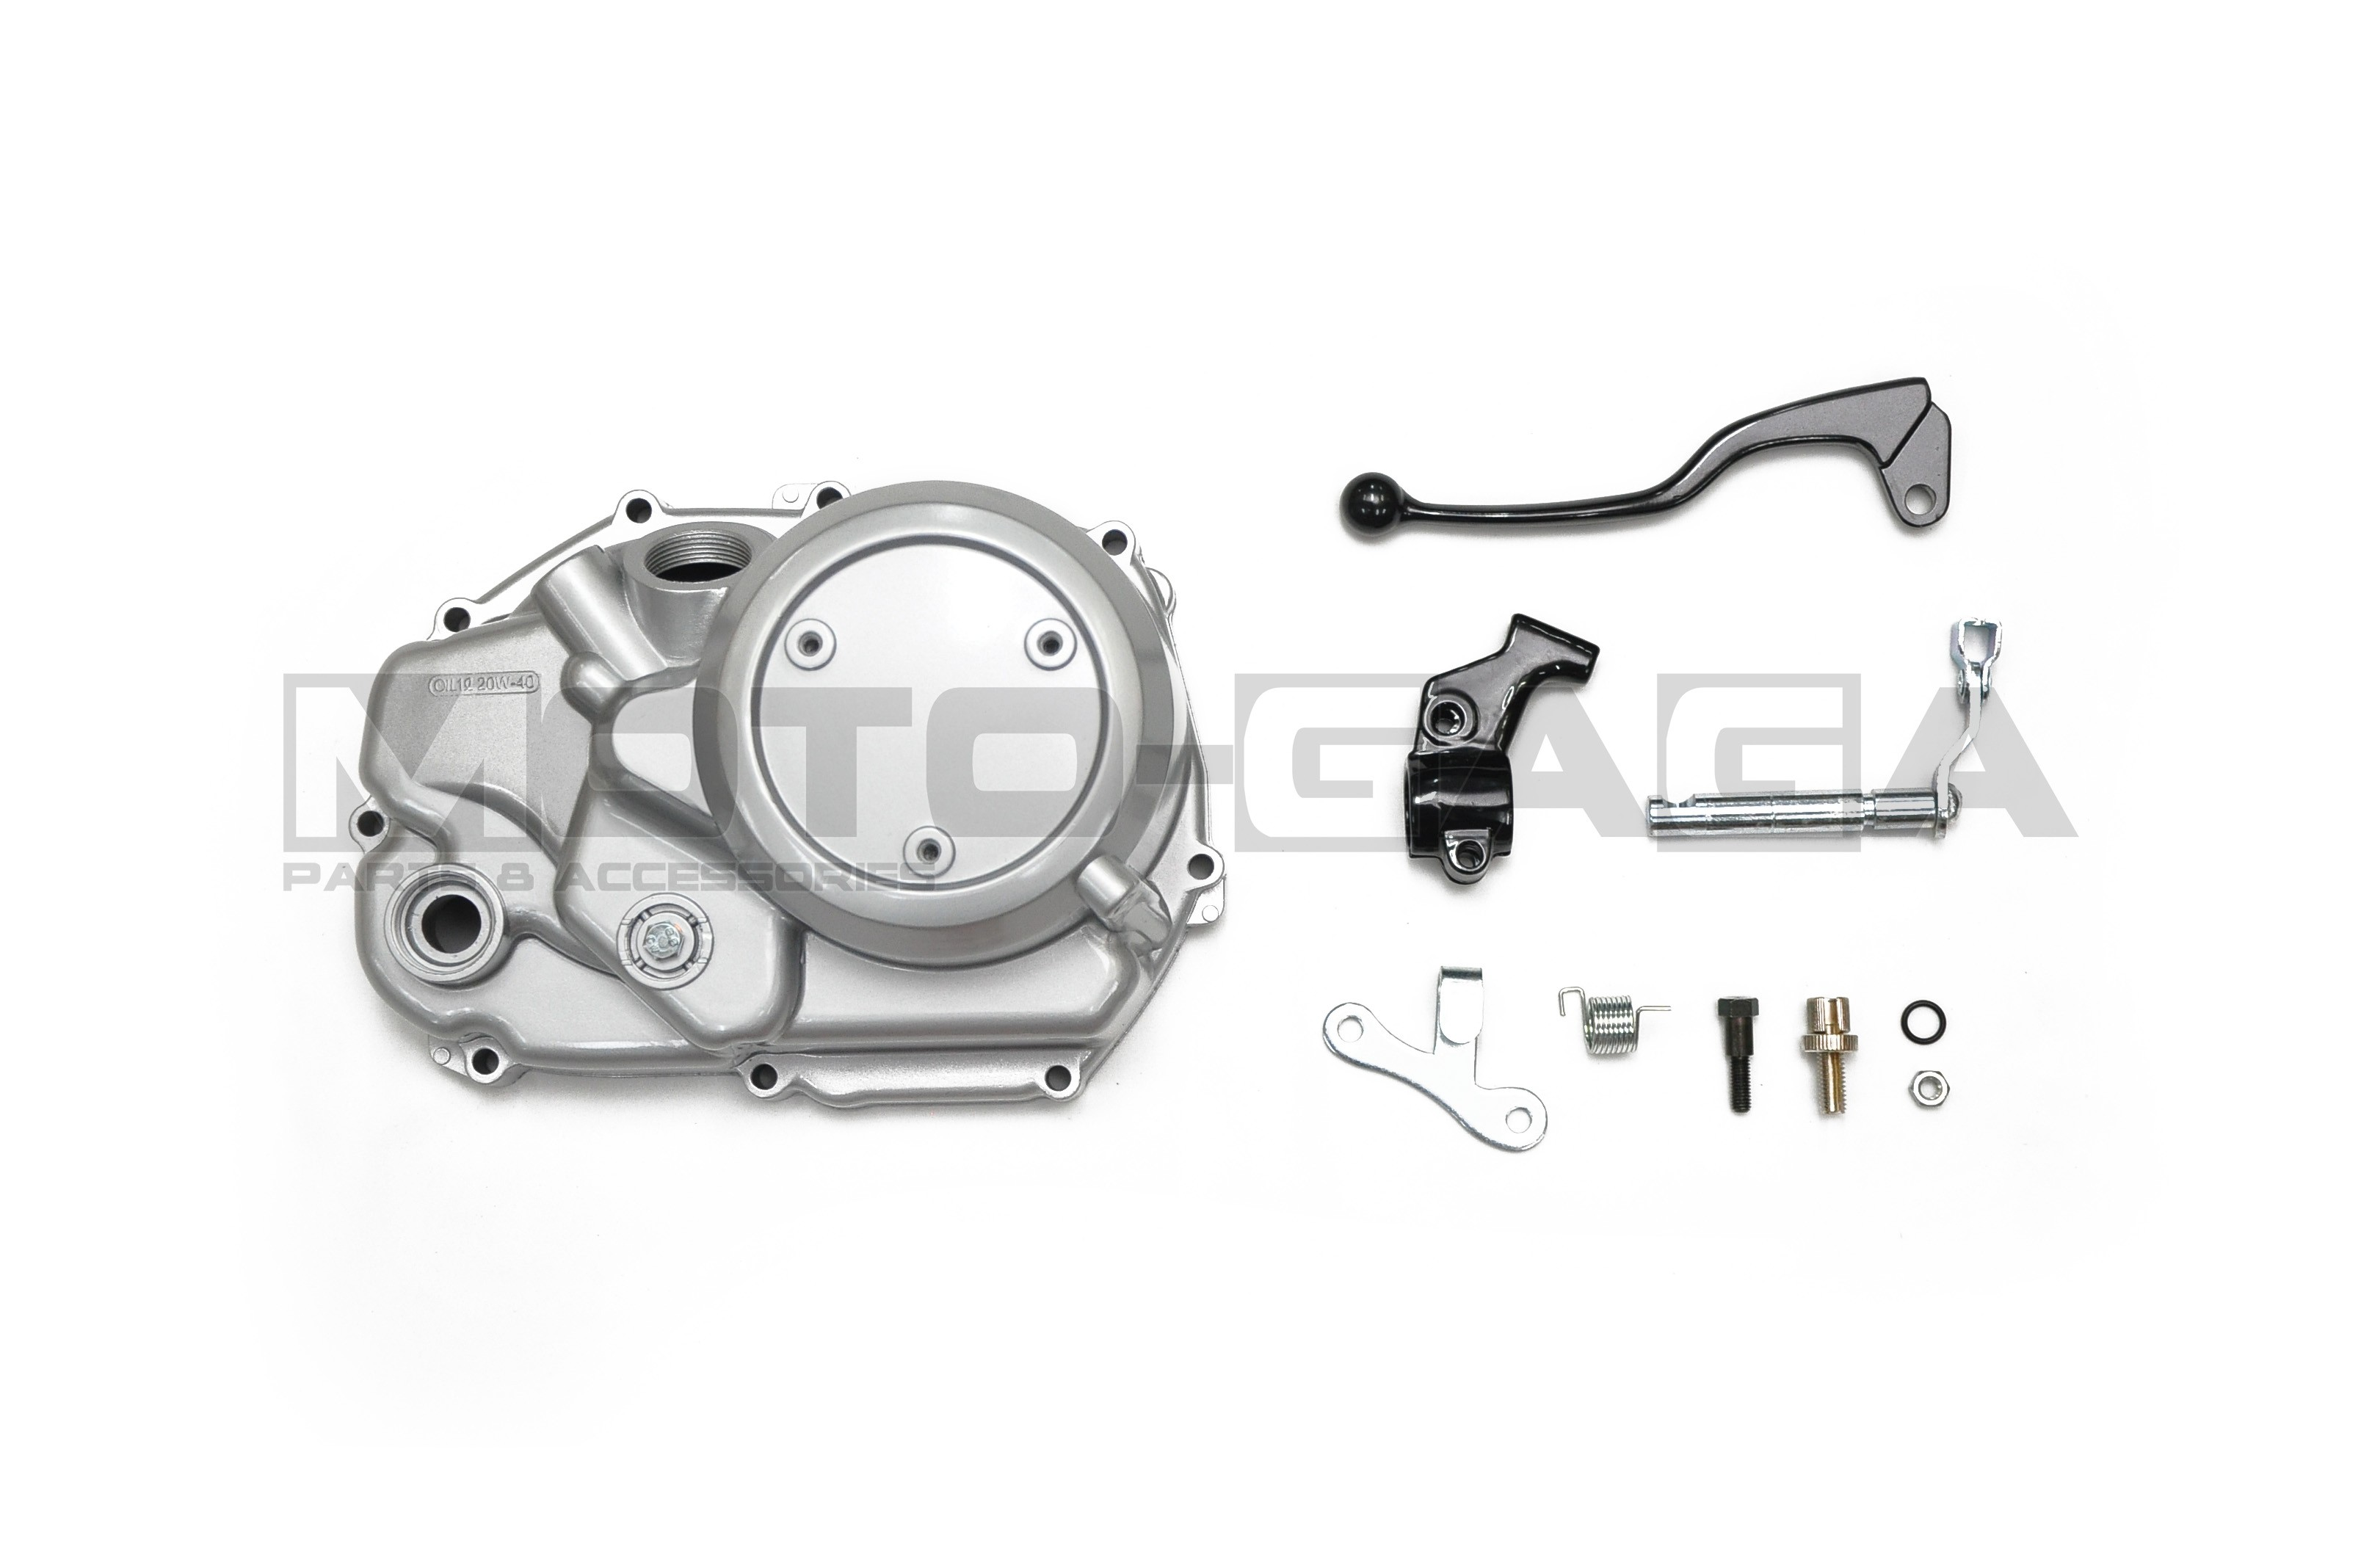 Honda Gx620 Diagram Html on Honda Gx630 Engine Part Diagrams